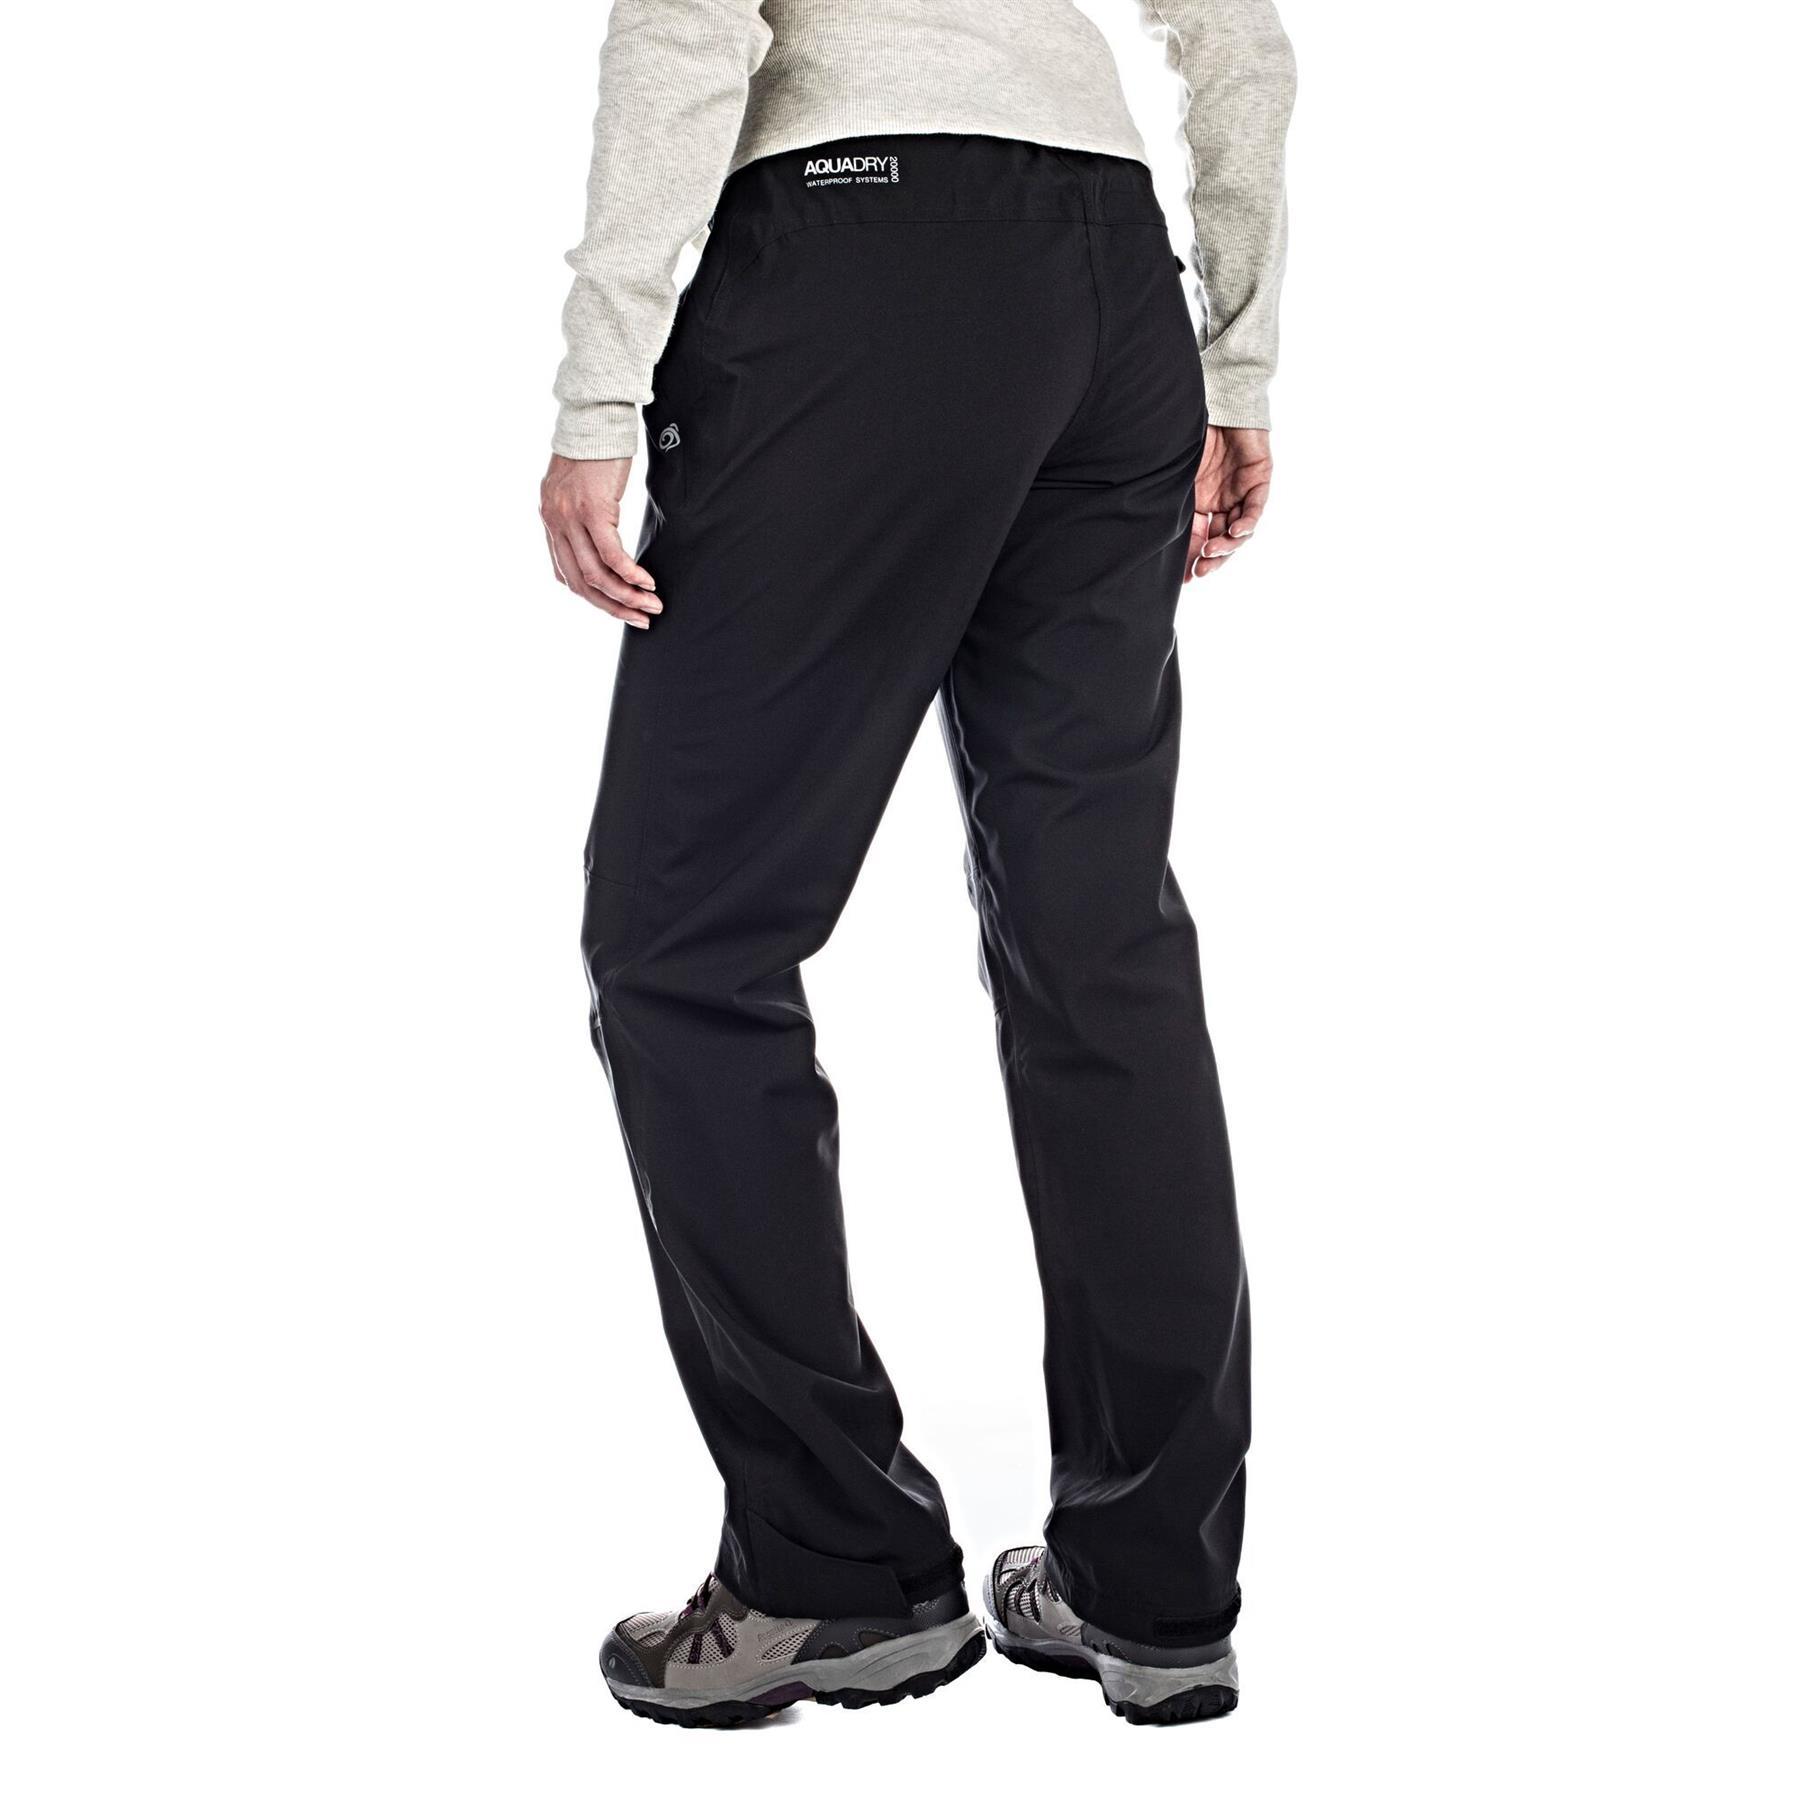 miniatuur 4 - Craghoppers Womens Aysgarth Waterproof Stretch Trousers